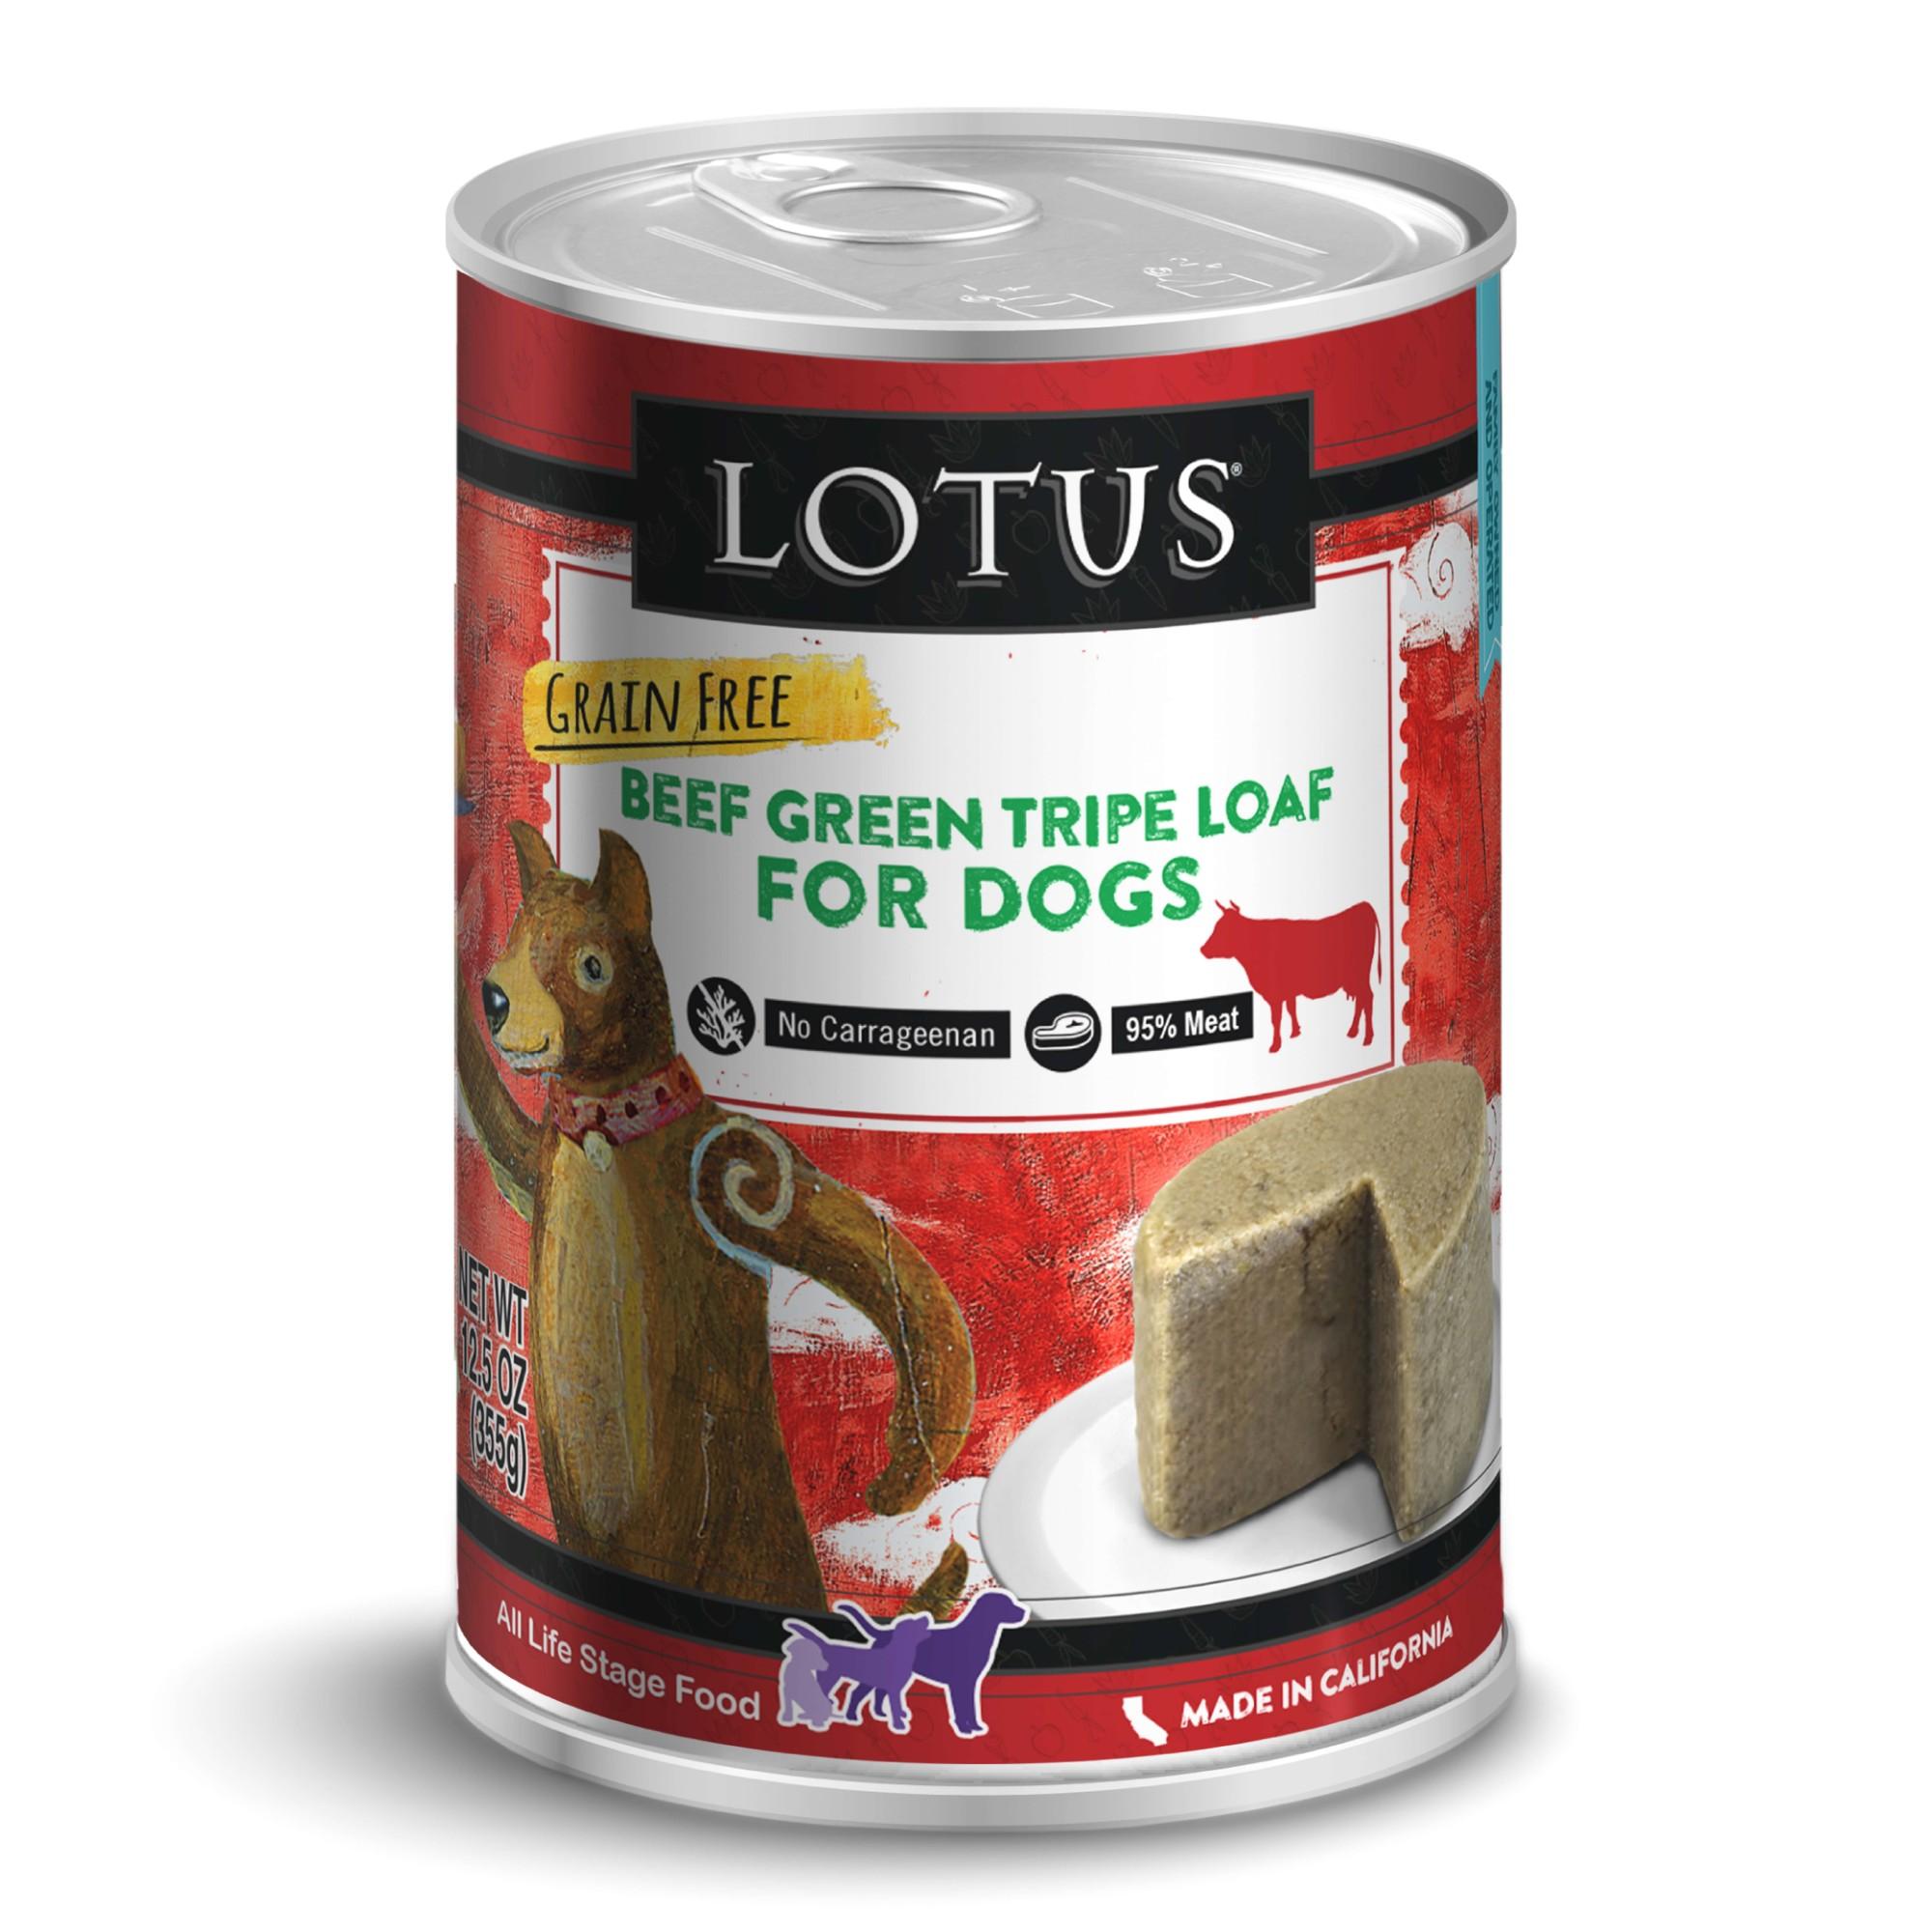 Lotus Beef Green Tripe Loaf Grain-Free Wet Dog Food, 12.5-oz